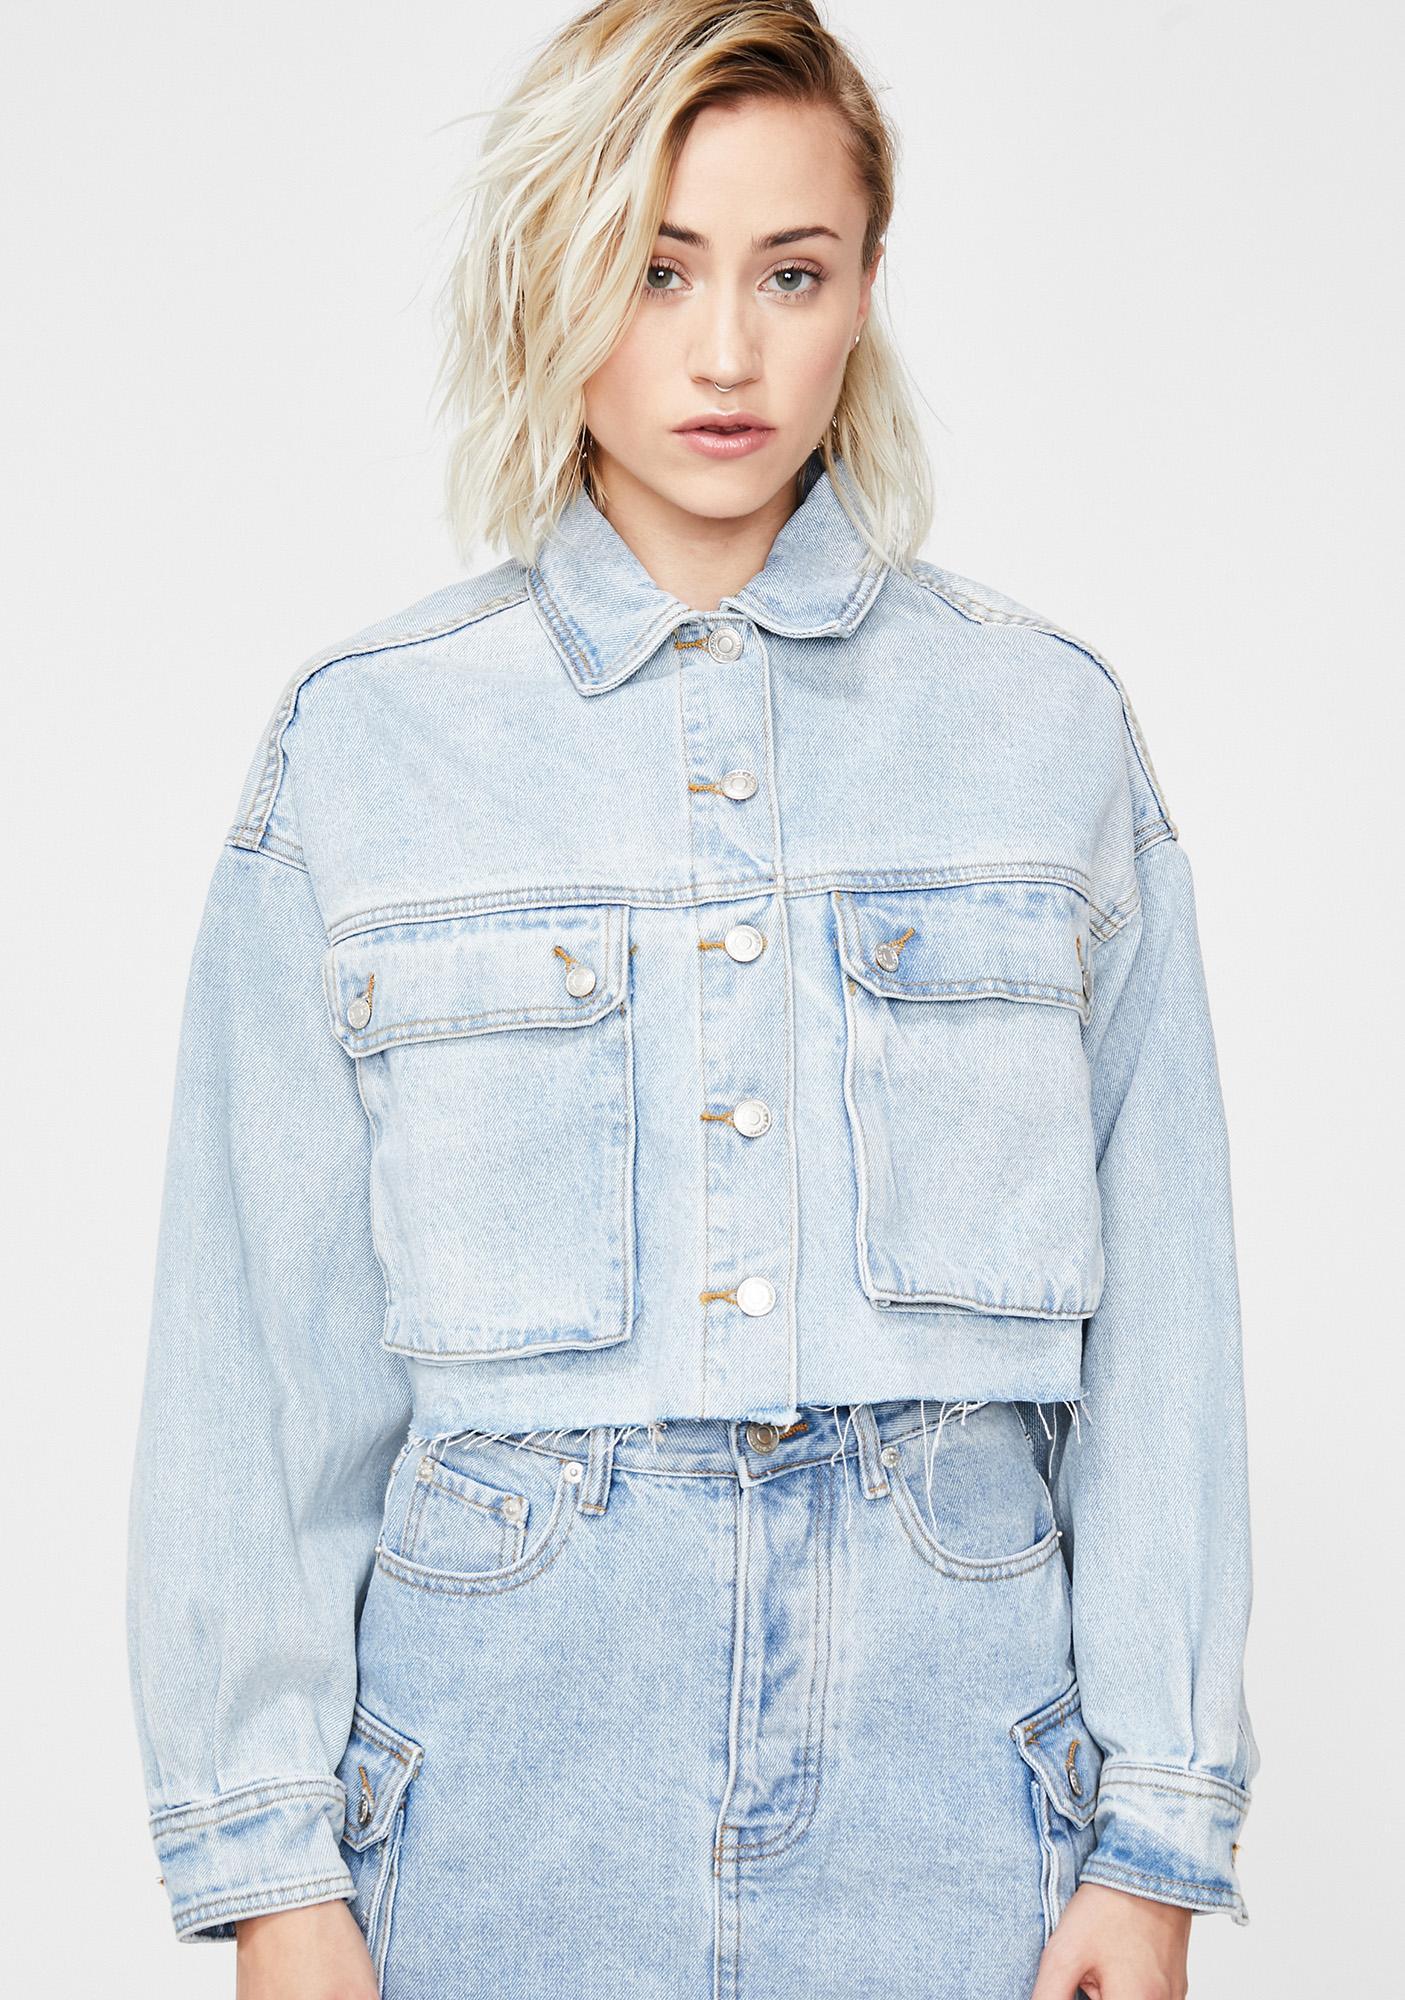 Just Chillin' Denim Jacket